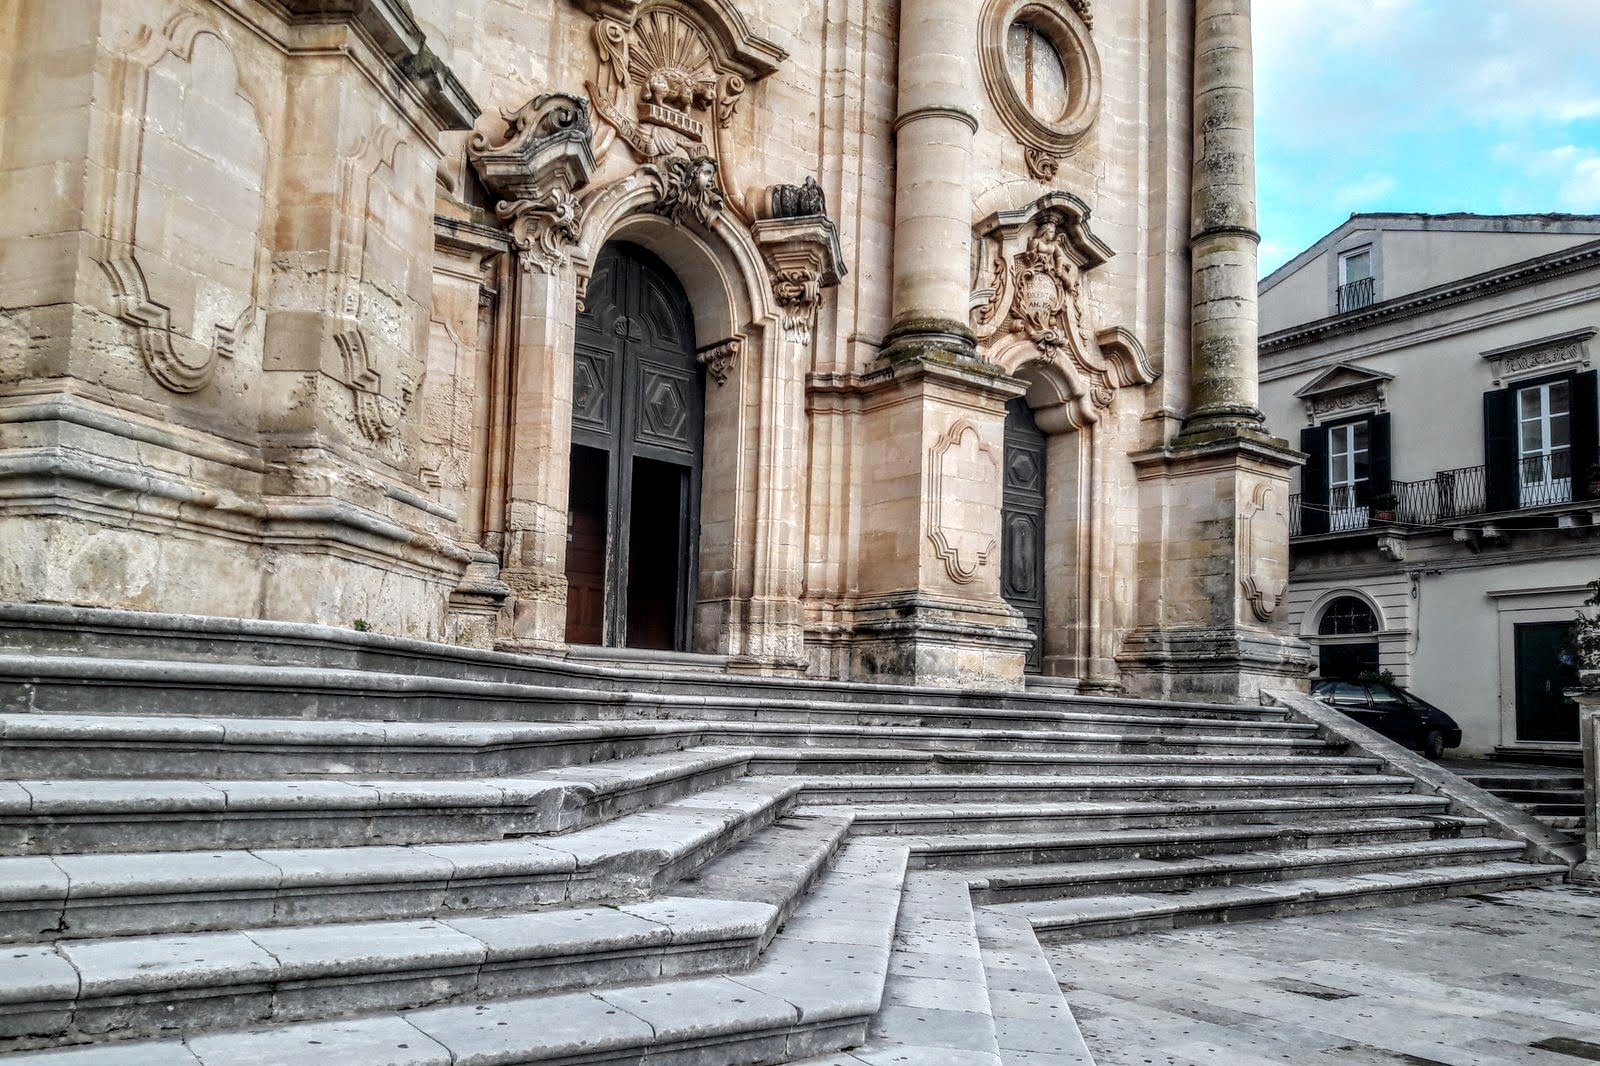 Modica, Sicilia (Sicily, Sycylia) / Italia (Italy, Włochy)